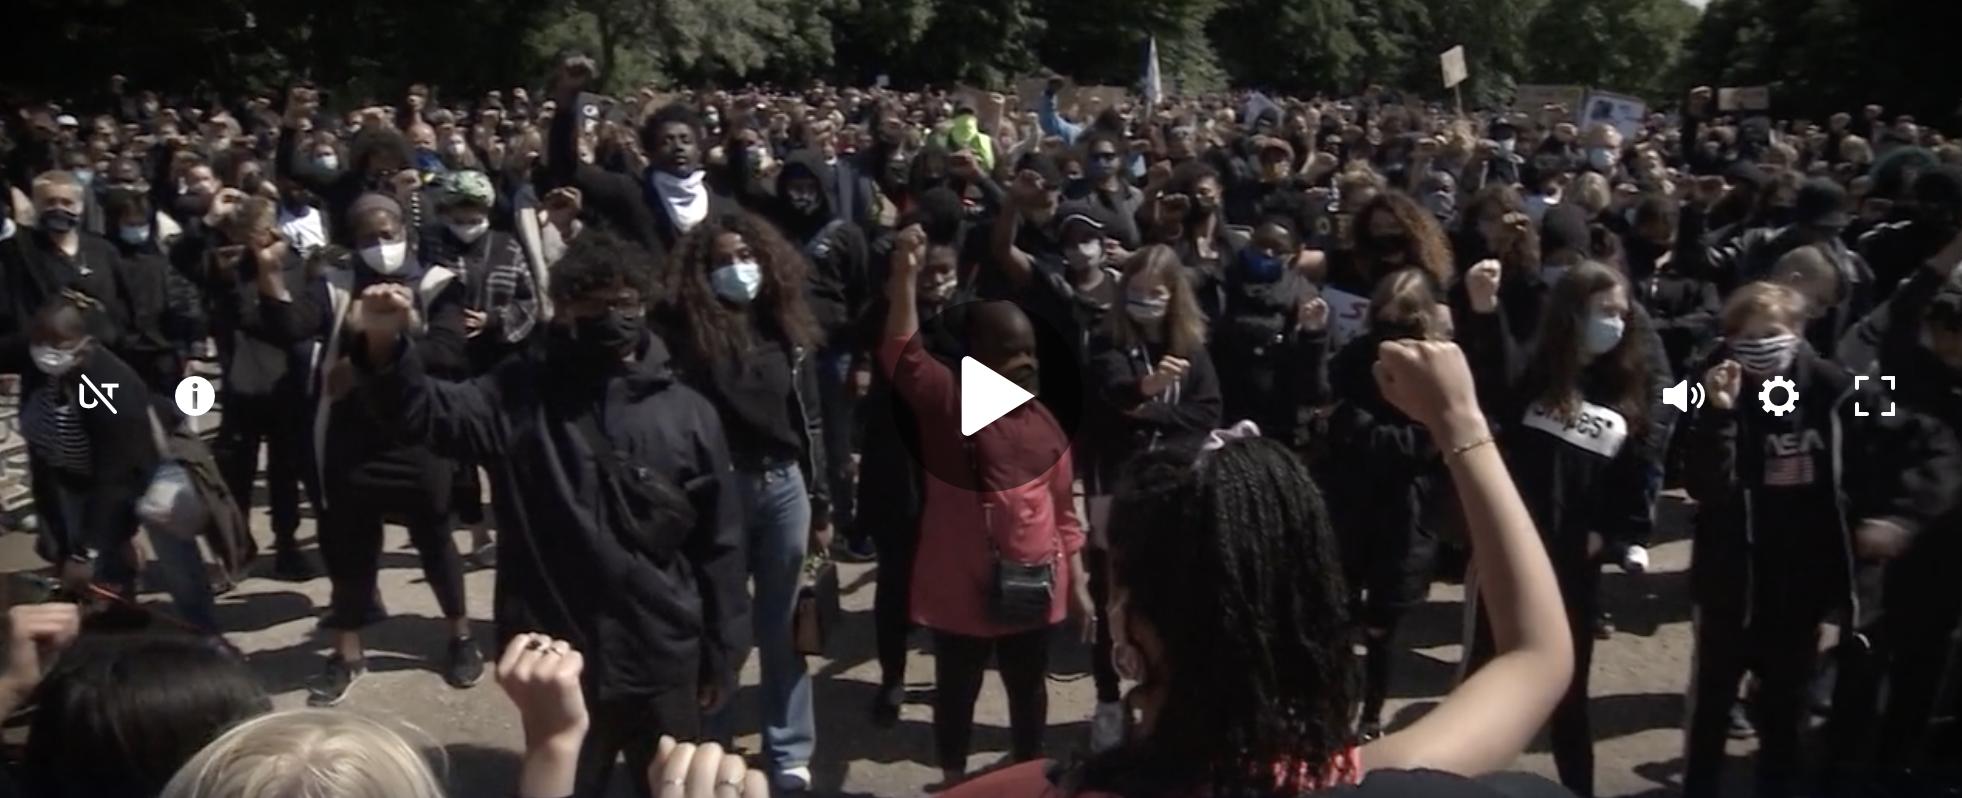 17-jährige organisiert Anti-Rassismus-Demo in Flensburg